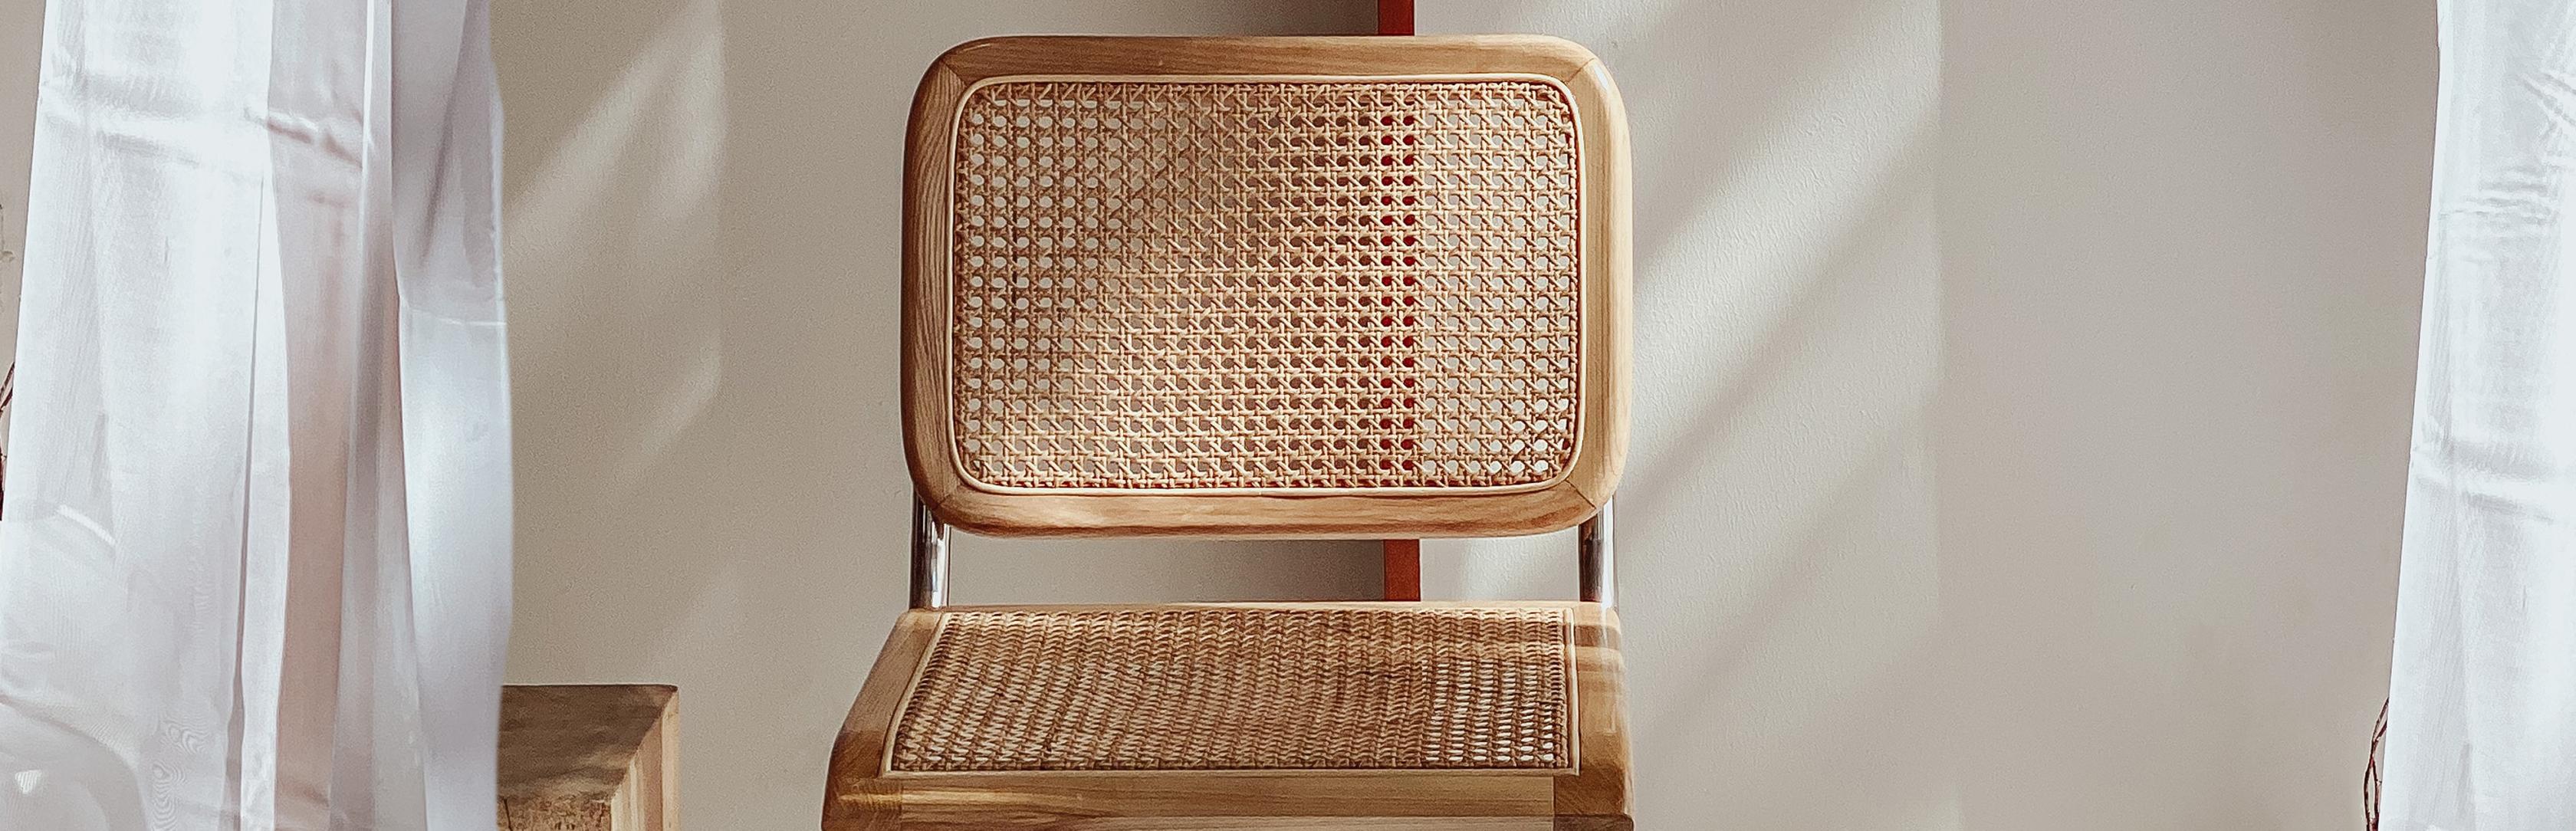 Pezzi Di Design Da Avere deesup | second-hand design experience